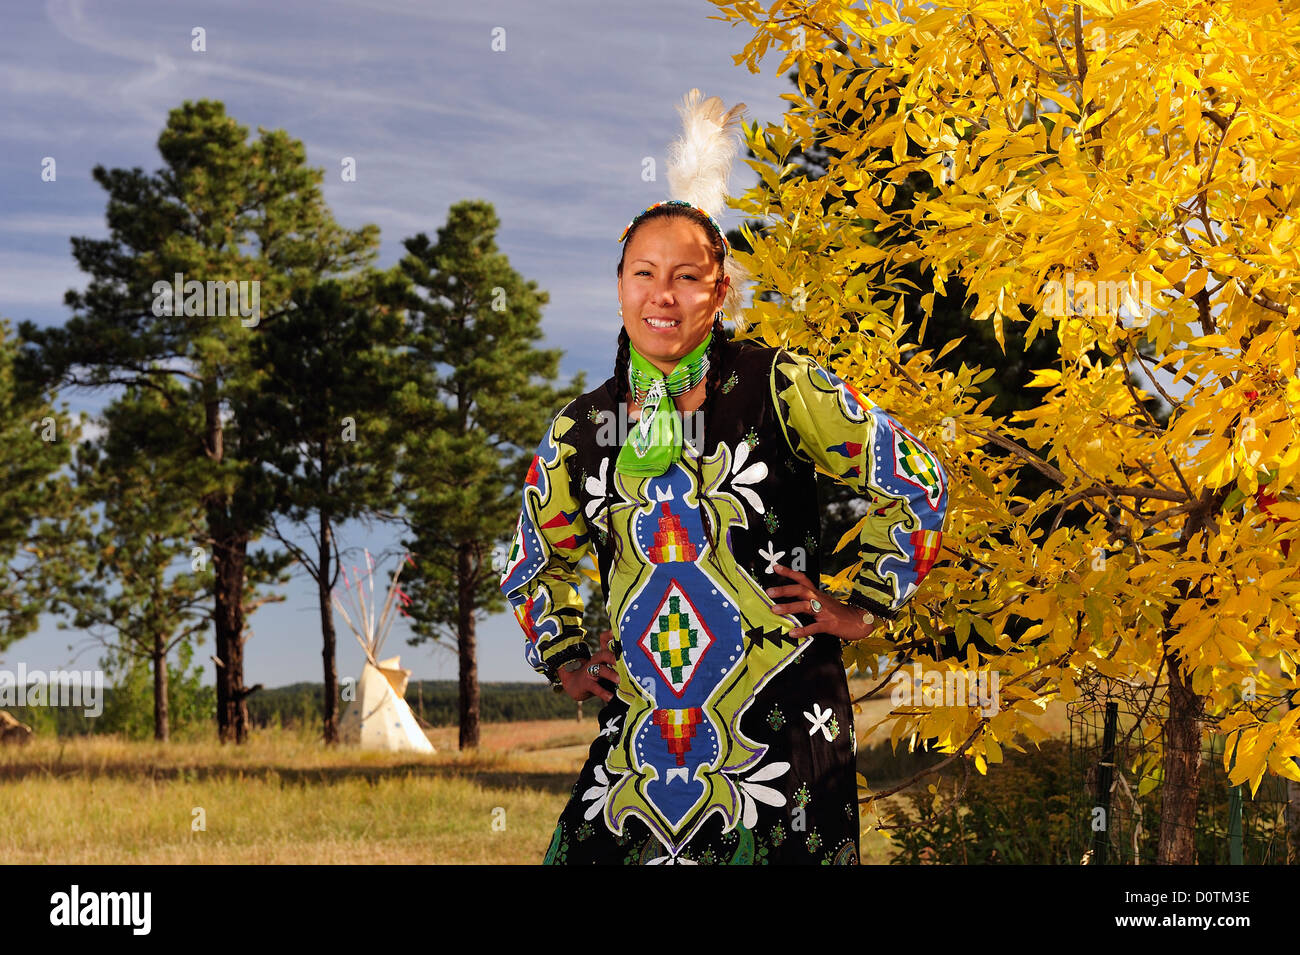 Jasmine Pickner, Oglala, Lakota, Sioux, Rapid City, South Dakota, native indian, indian, costume, feathers, model - Stock Image